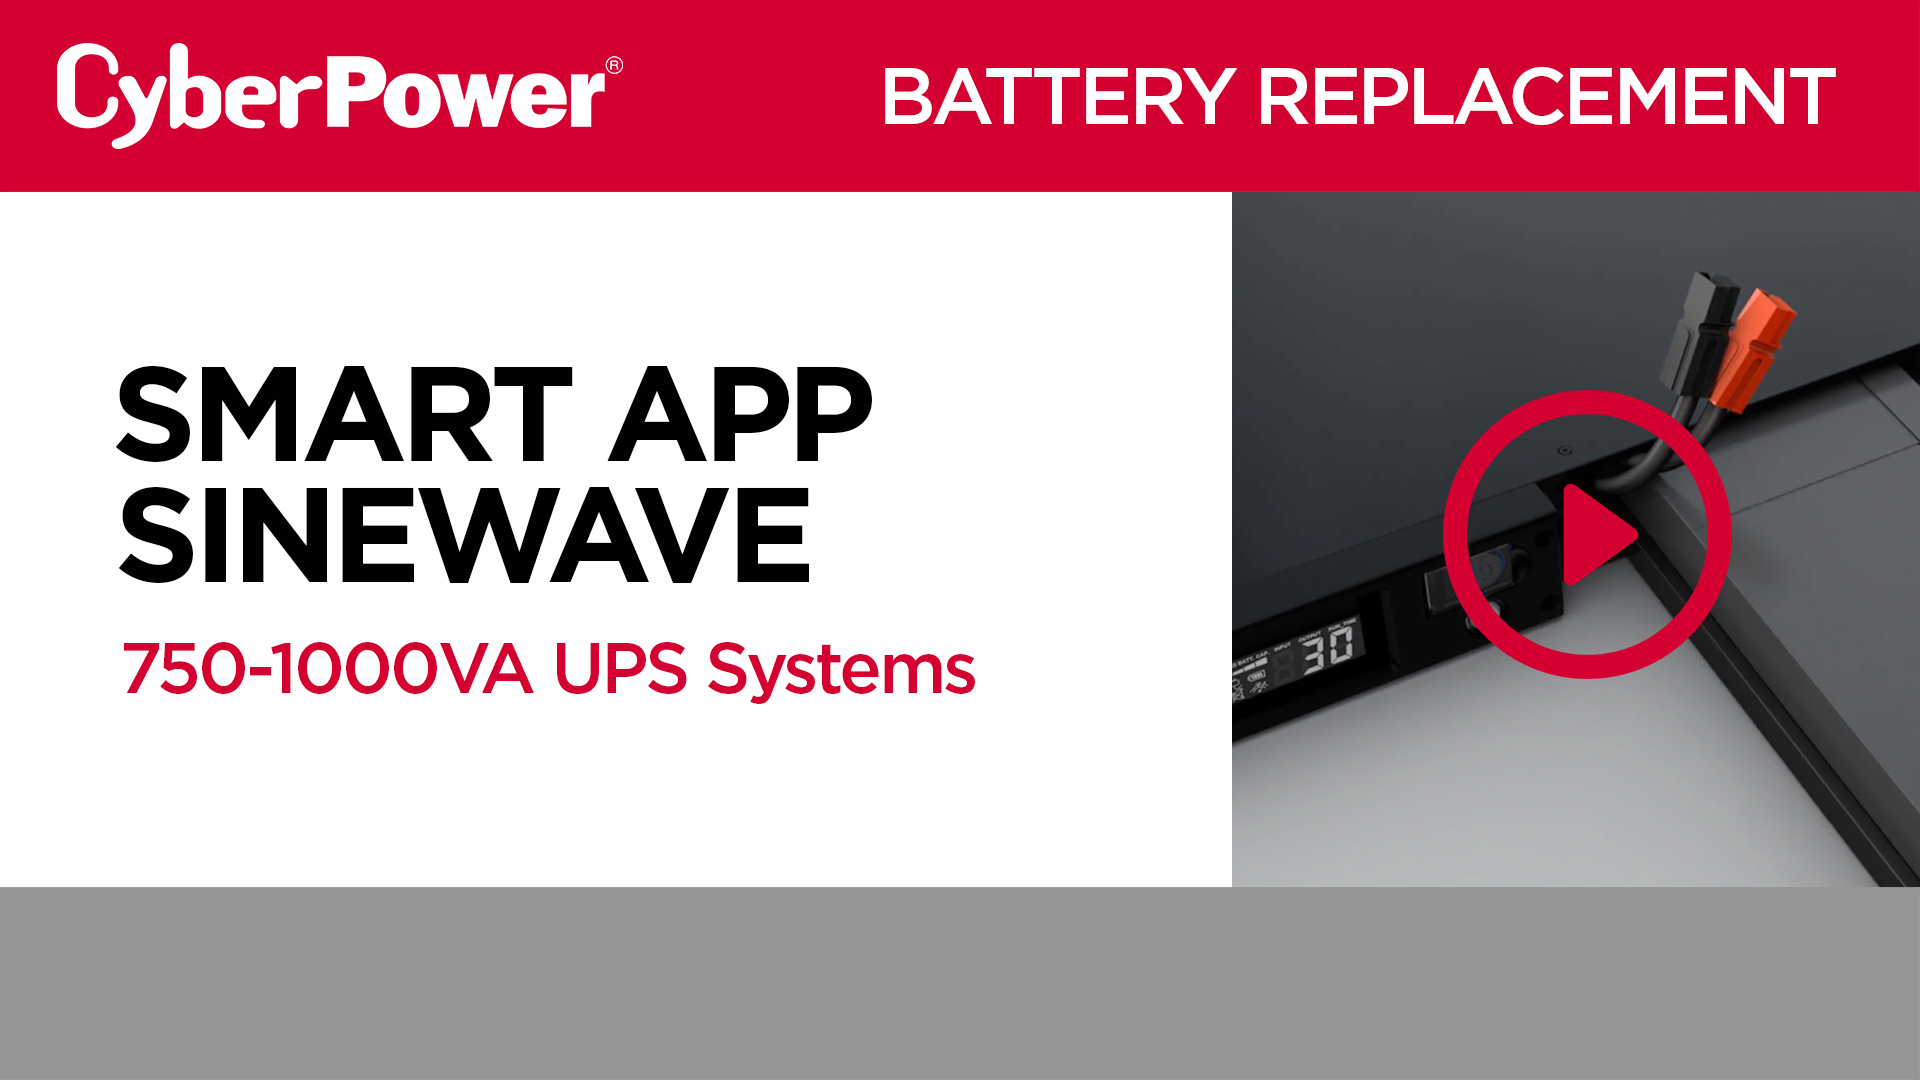 1U Smart App Sinewave 750-1000VA Series Replacement Battery